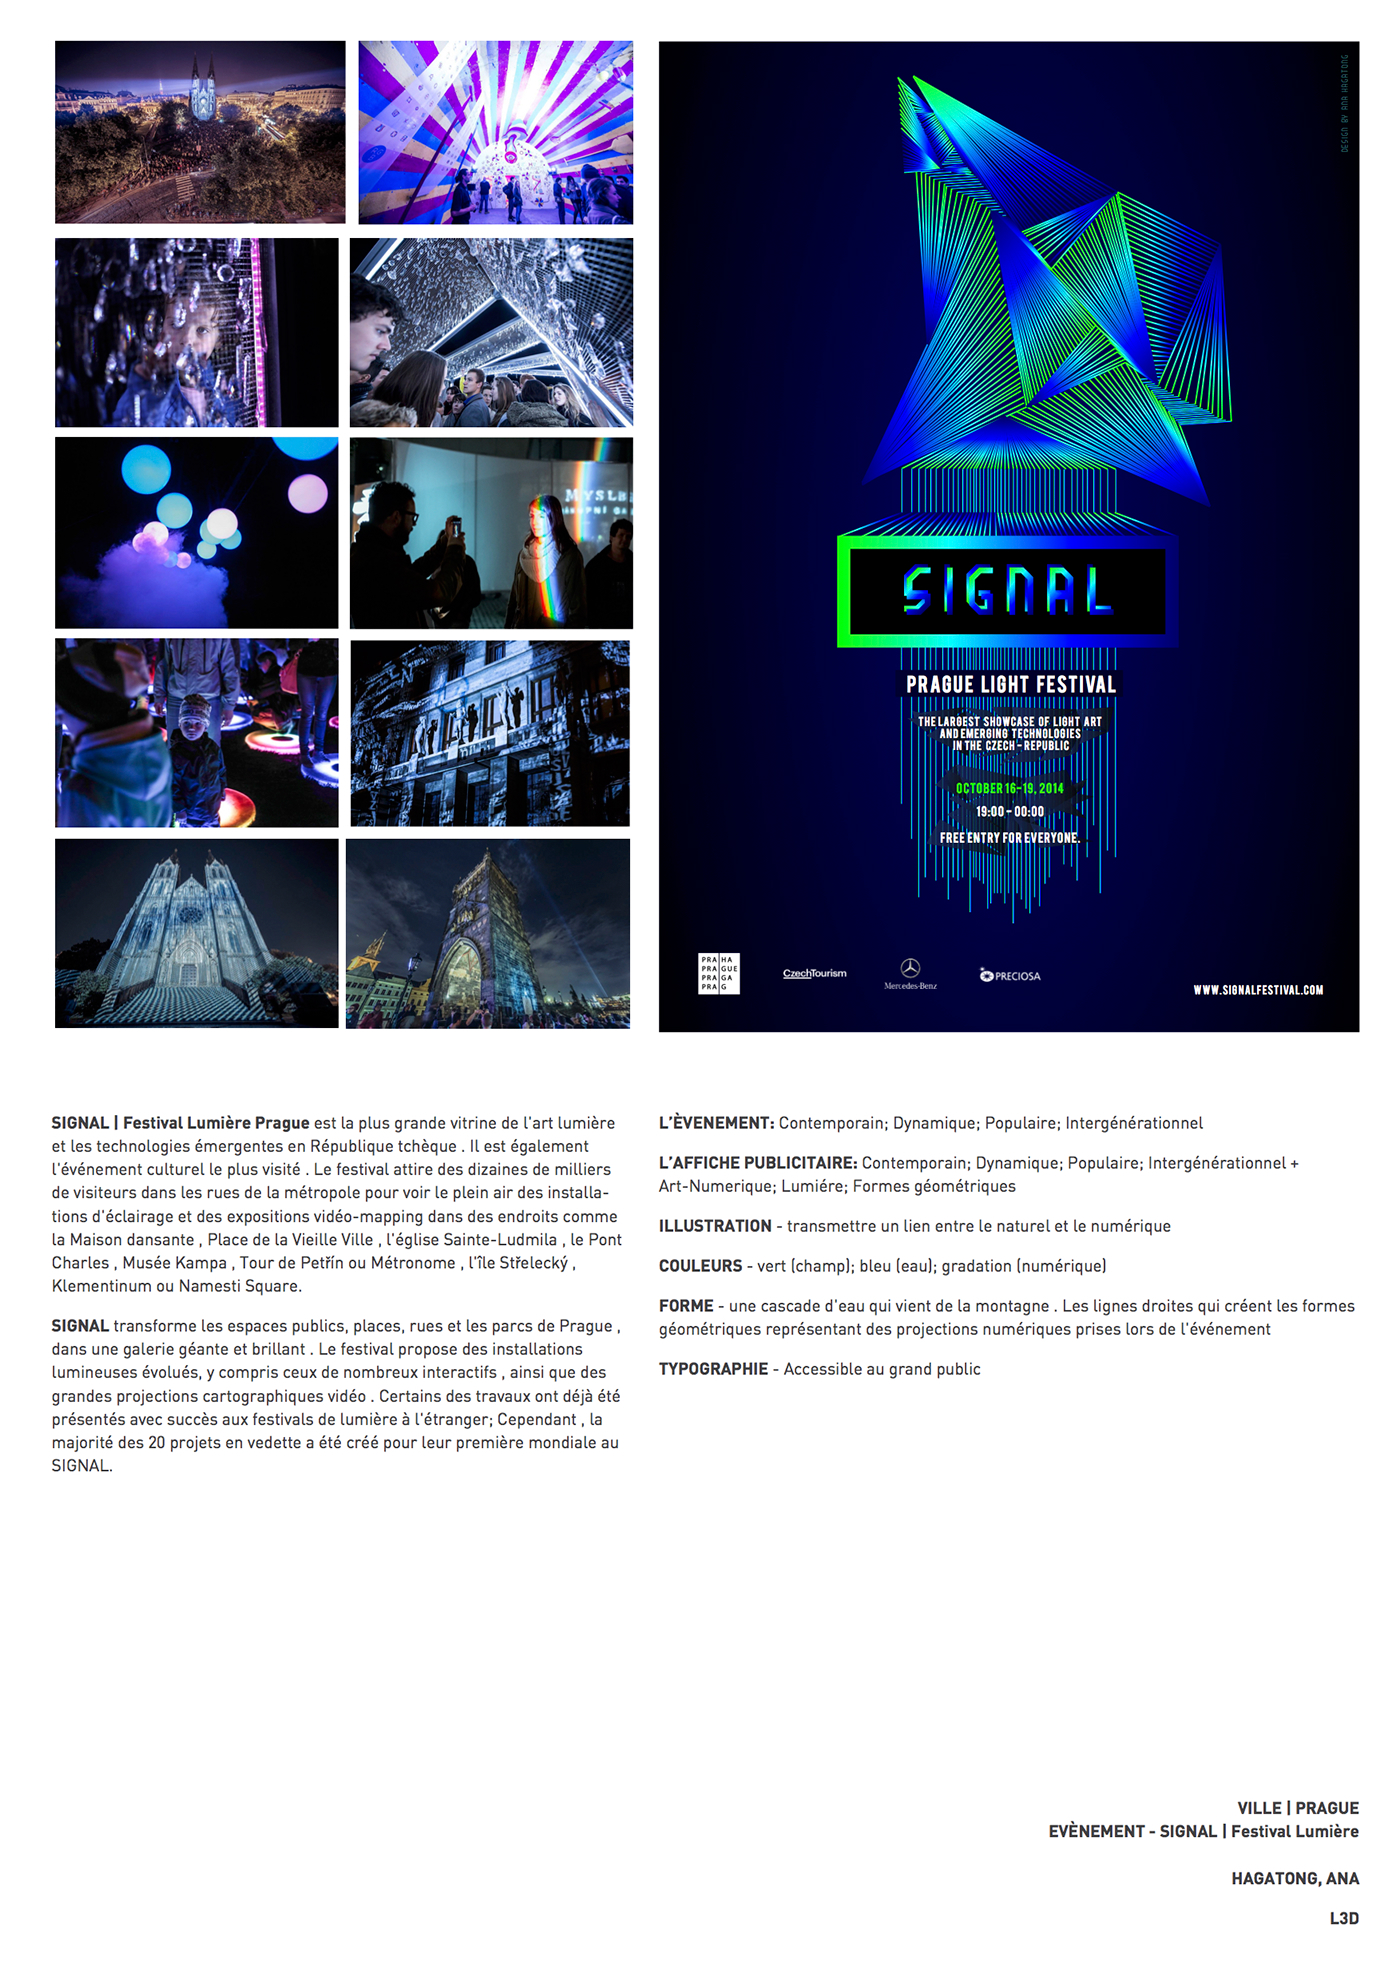 prague signal light festival poster graphic Conception Graphique